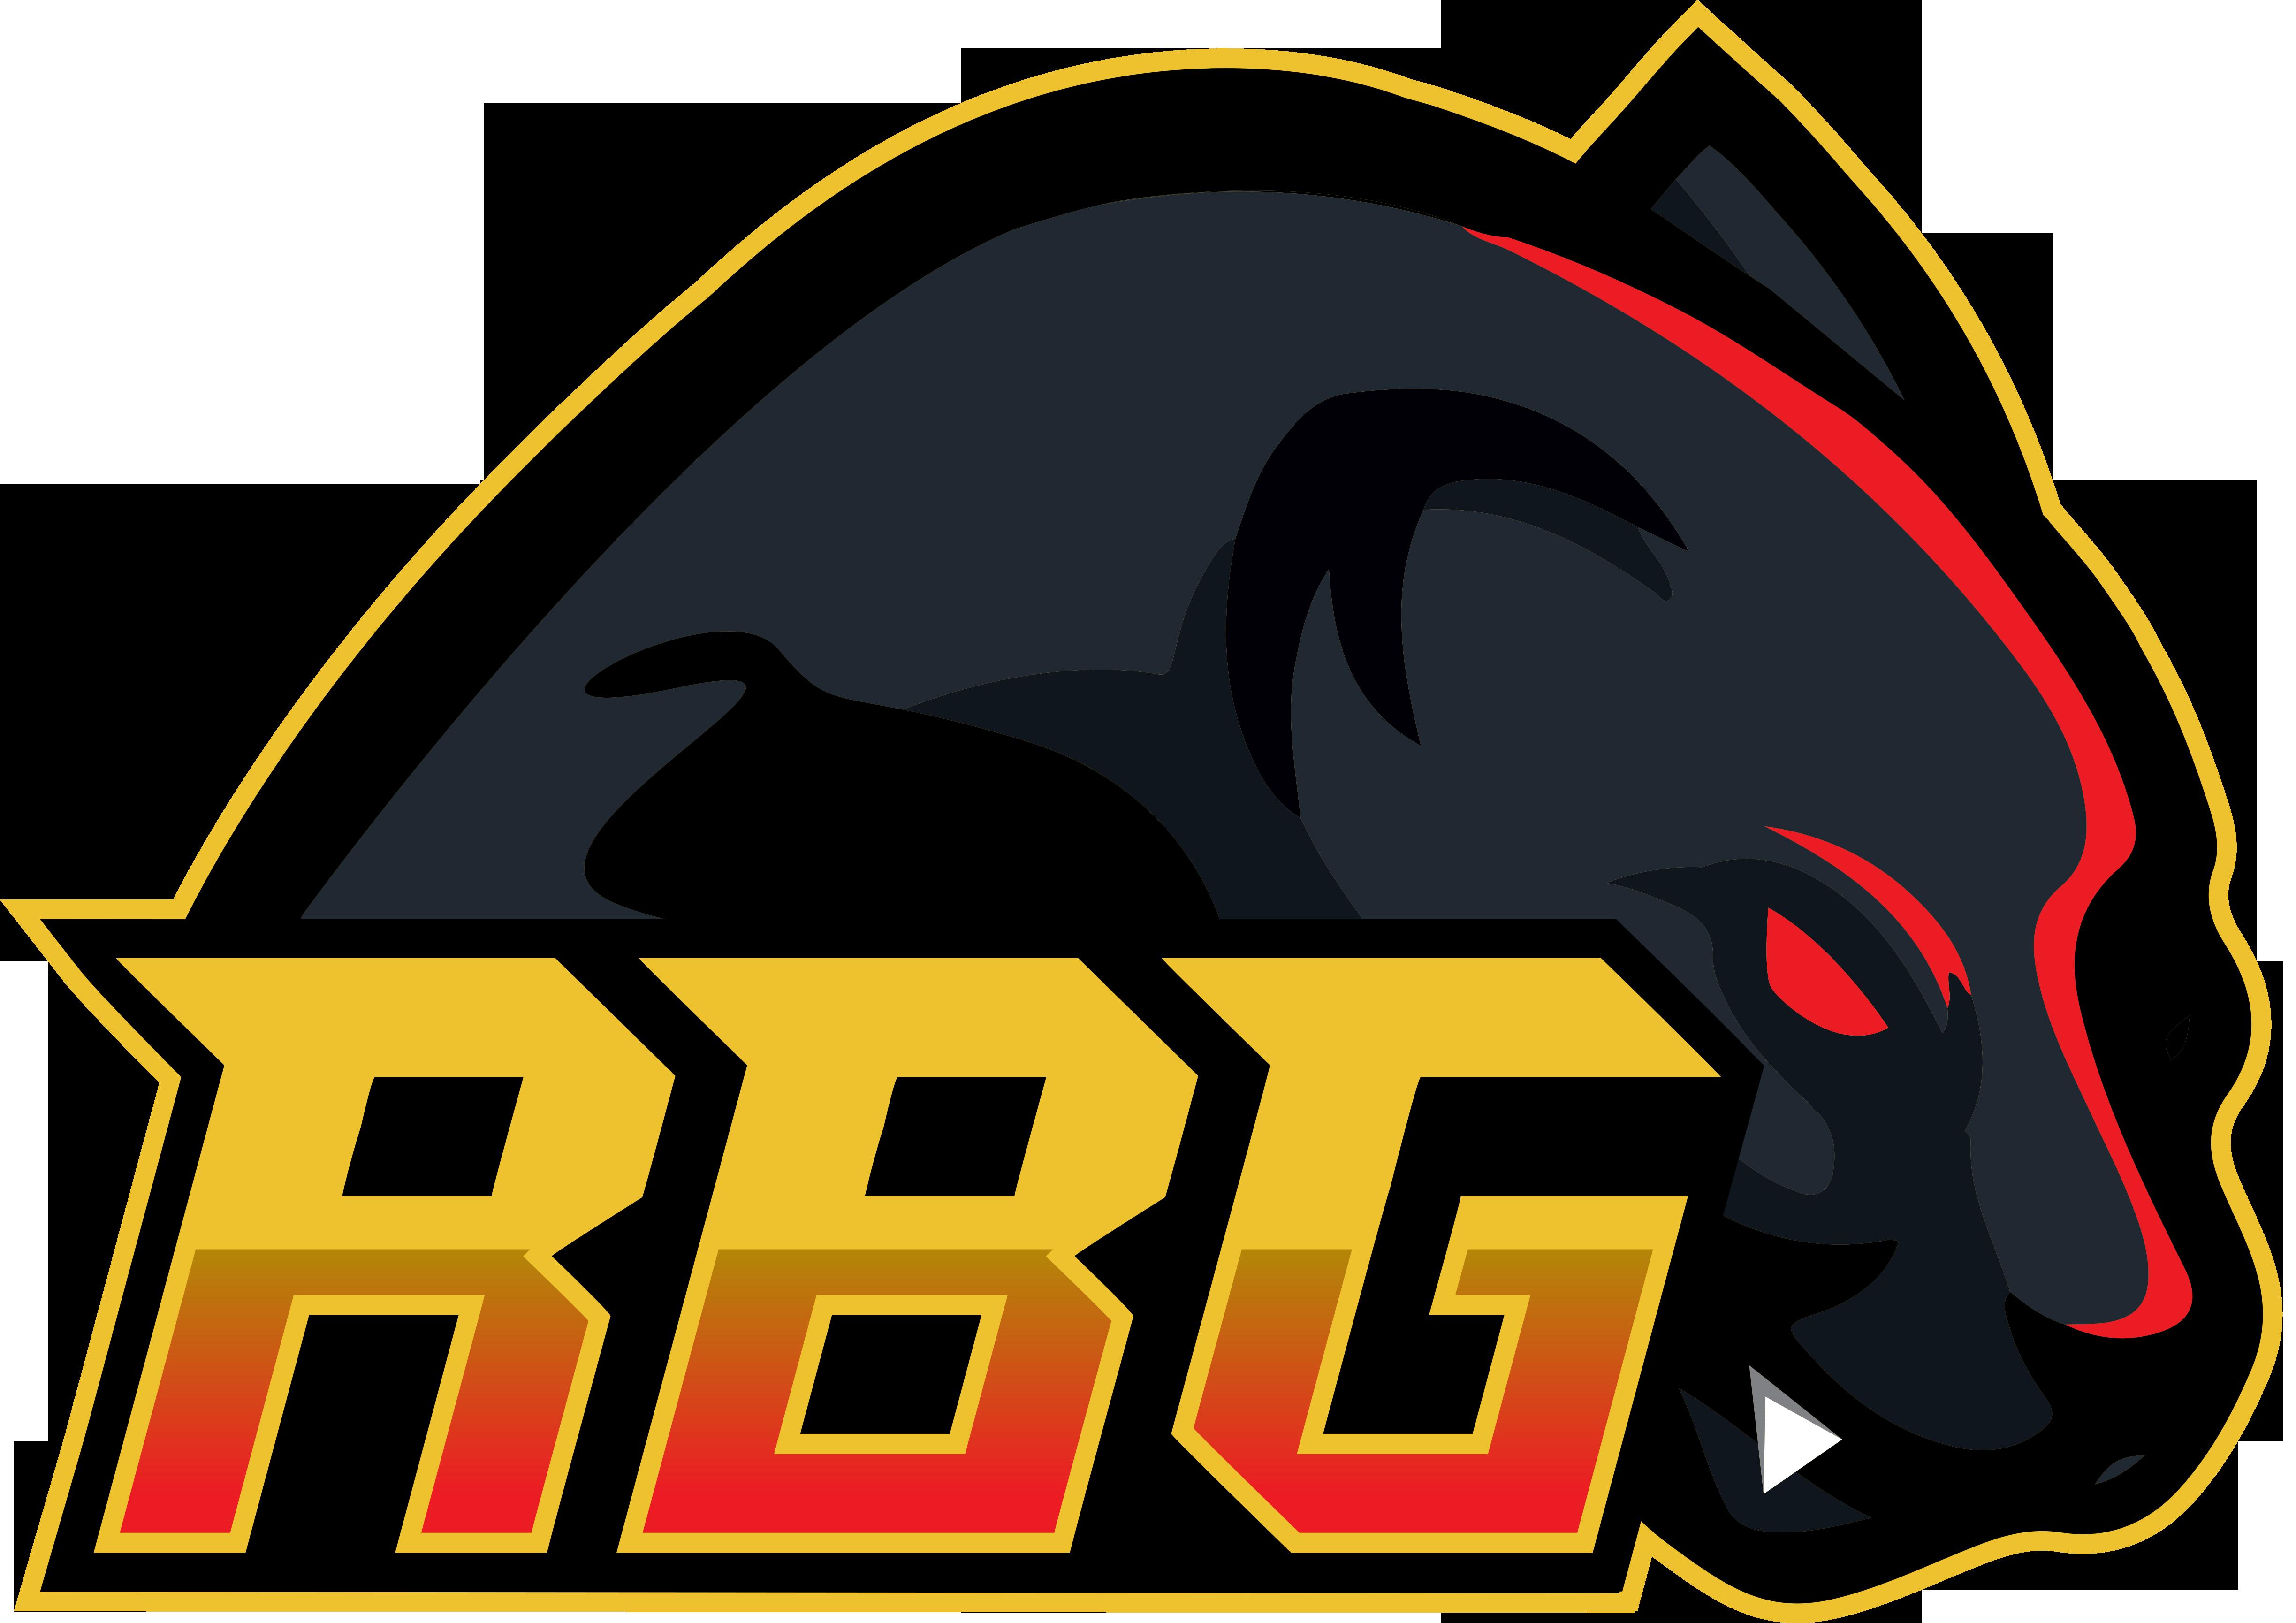 rbg-esports